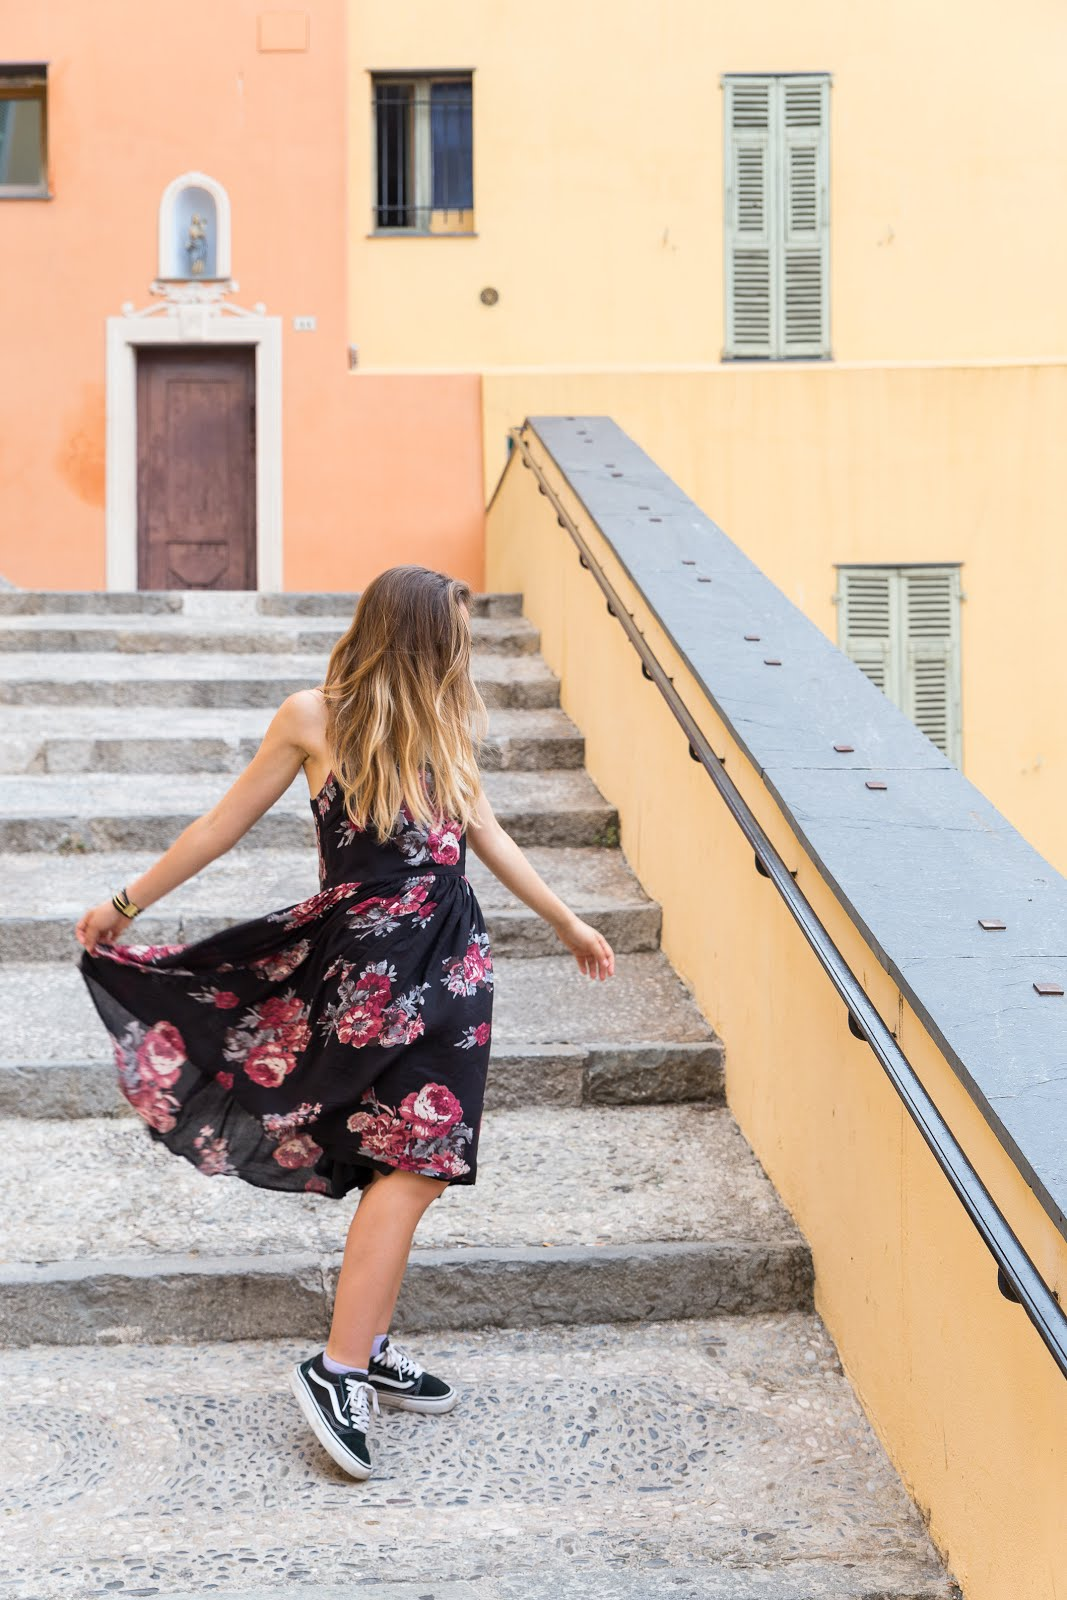 Balade en robe à fleurs // La Penderie de Chloe, blog mode